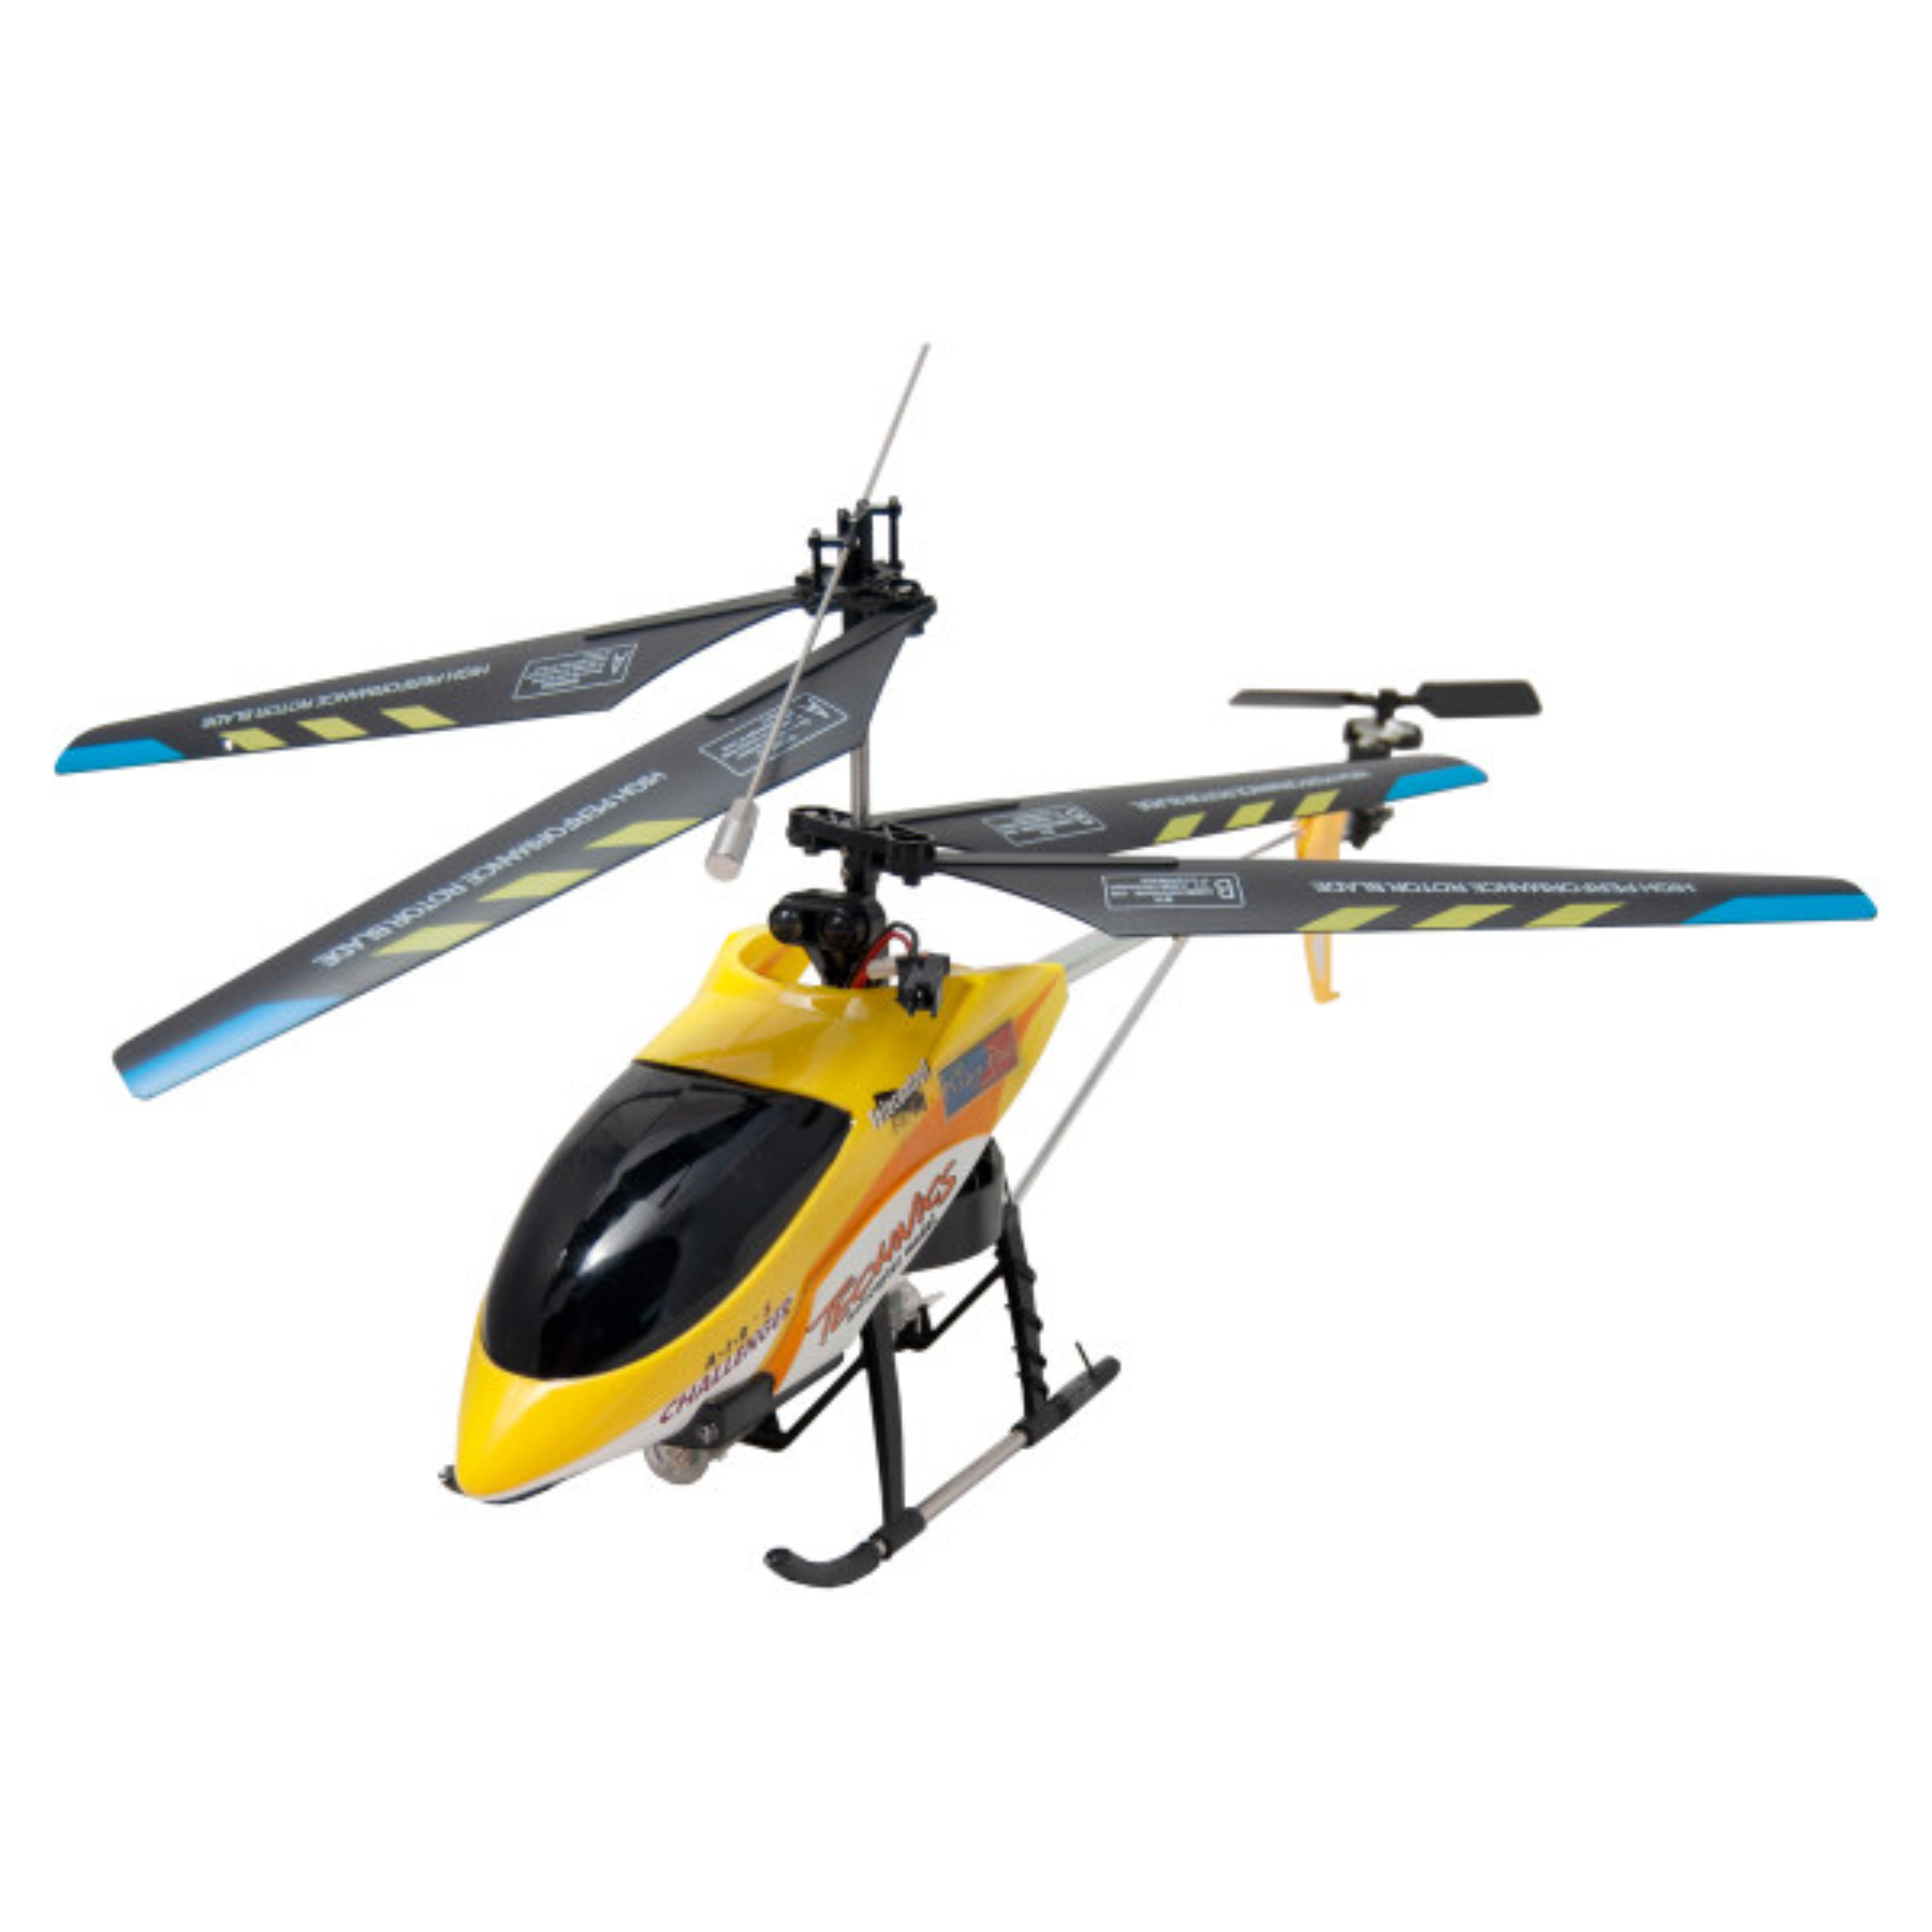 هلیکوپتر کنترلی کیدزپرو مدل SONIC XL